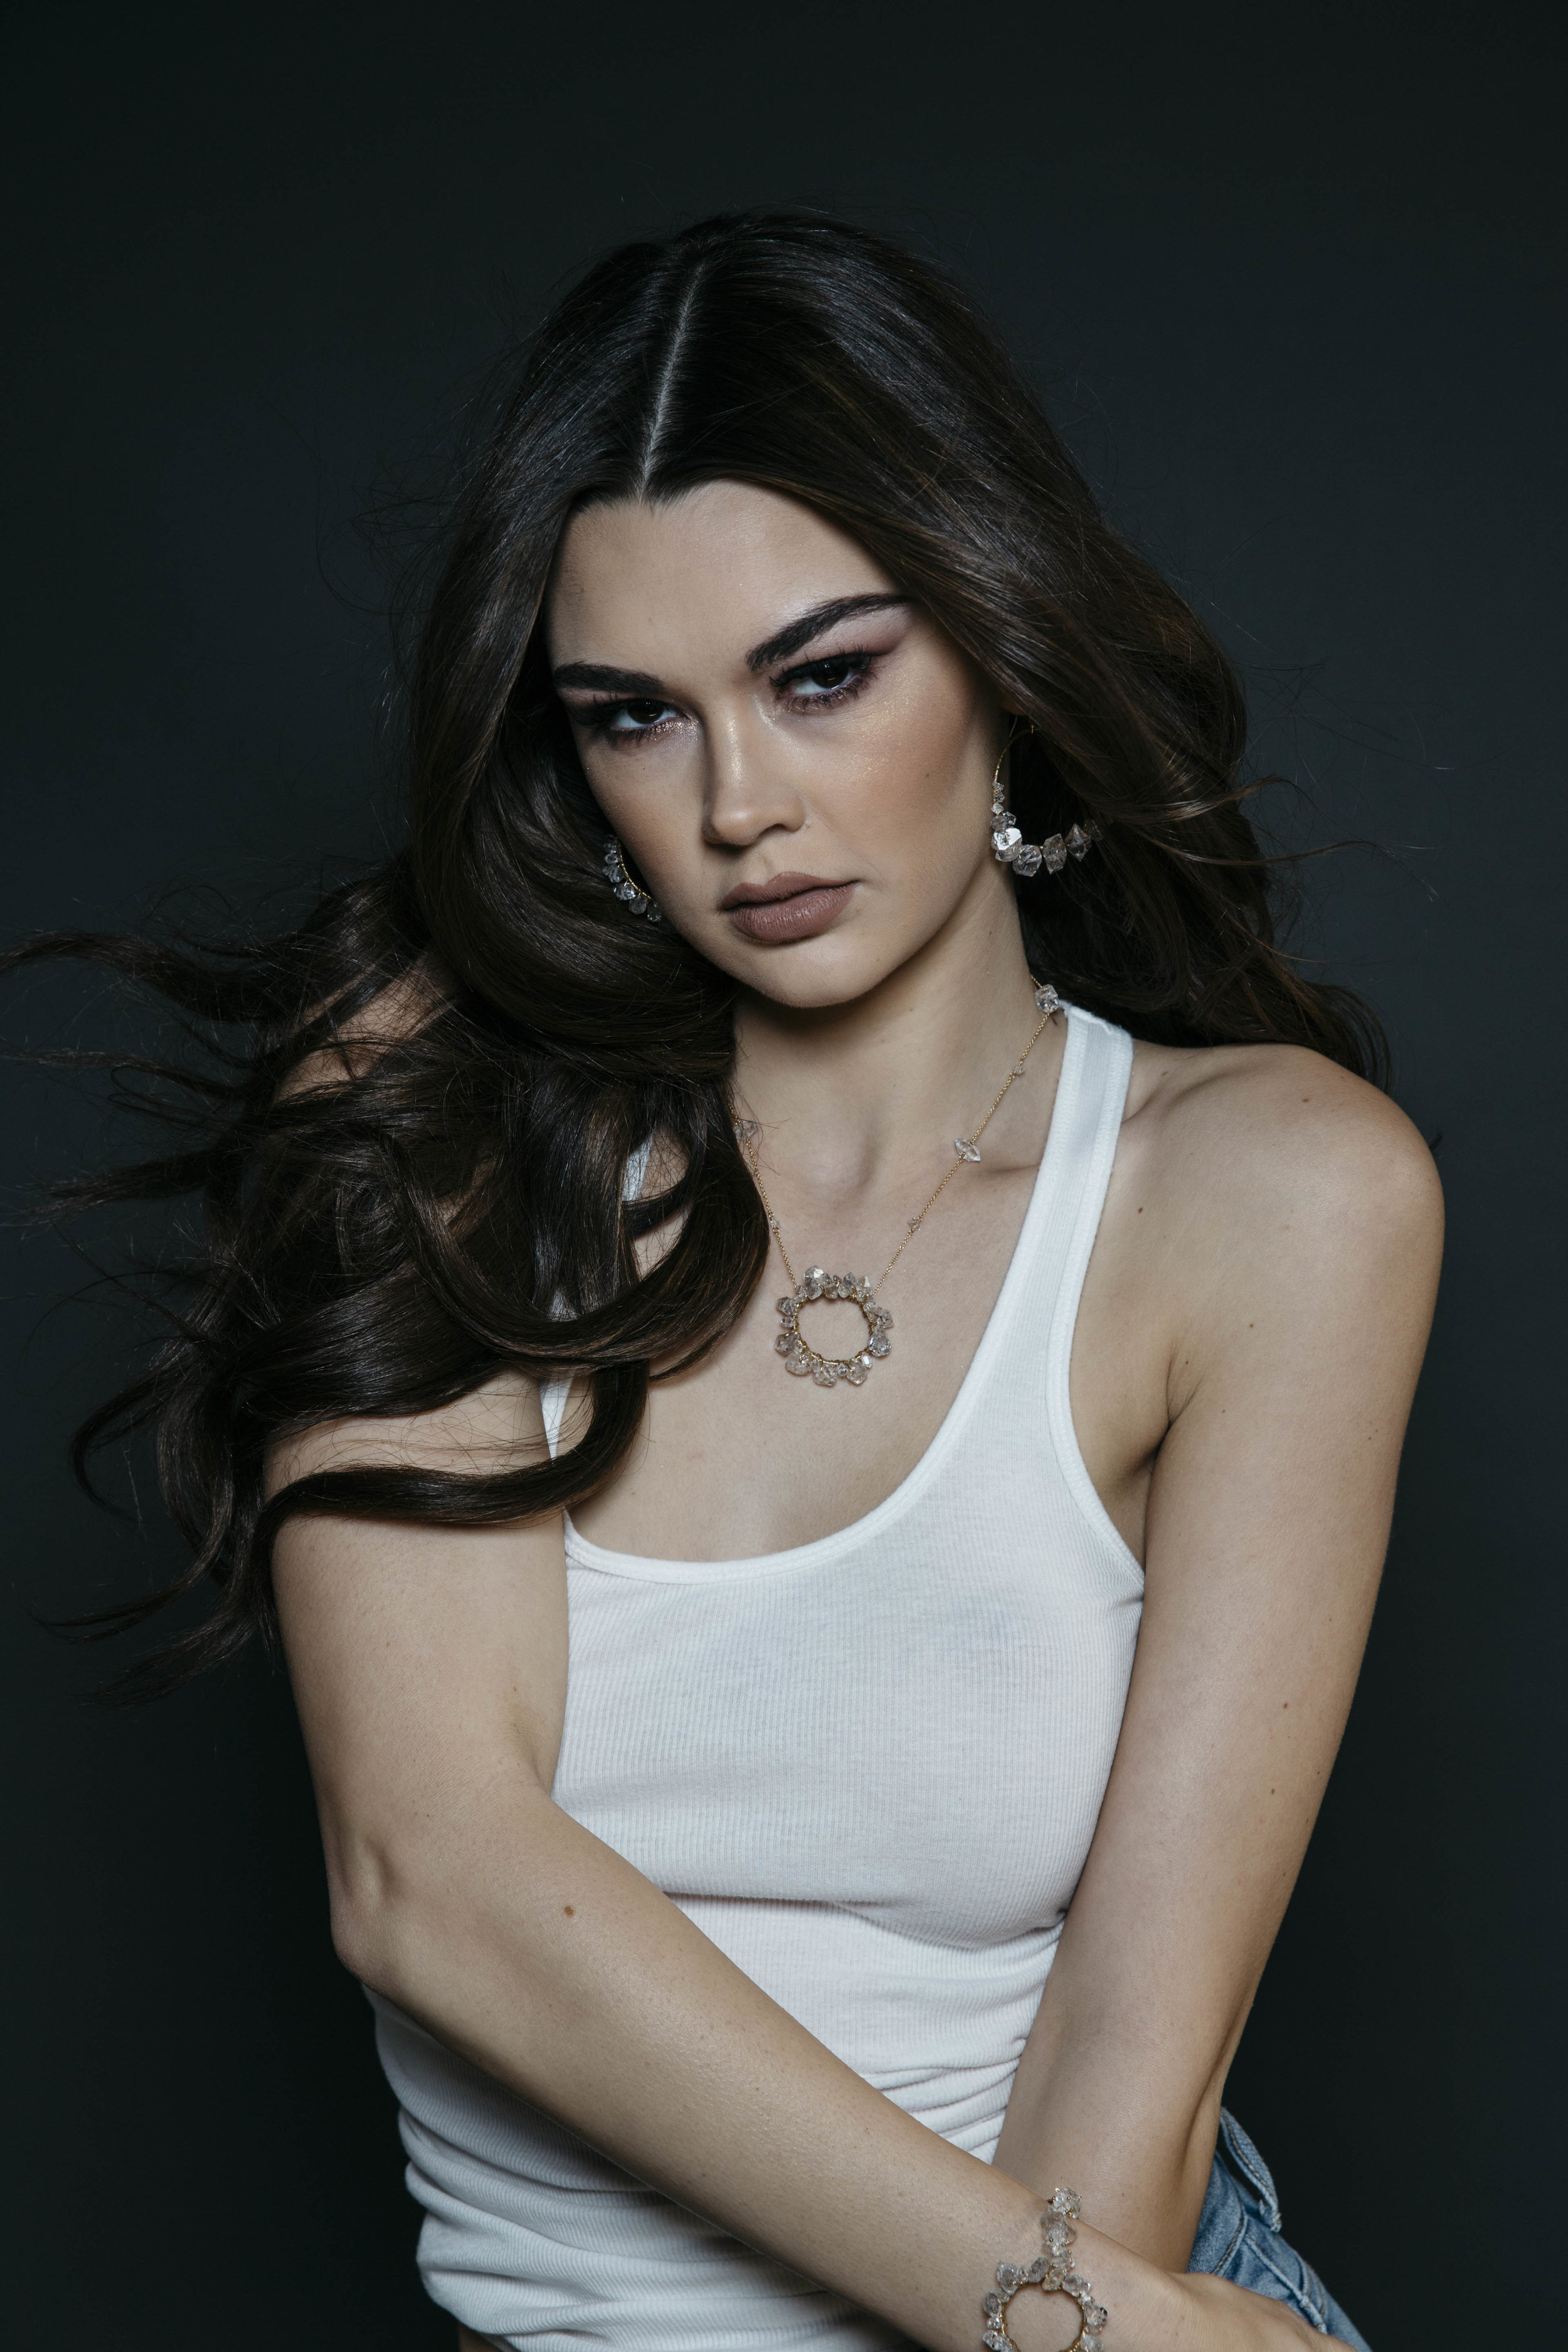 model wearing circle herkimer diamond pendant necklace